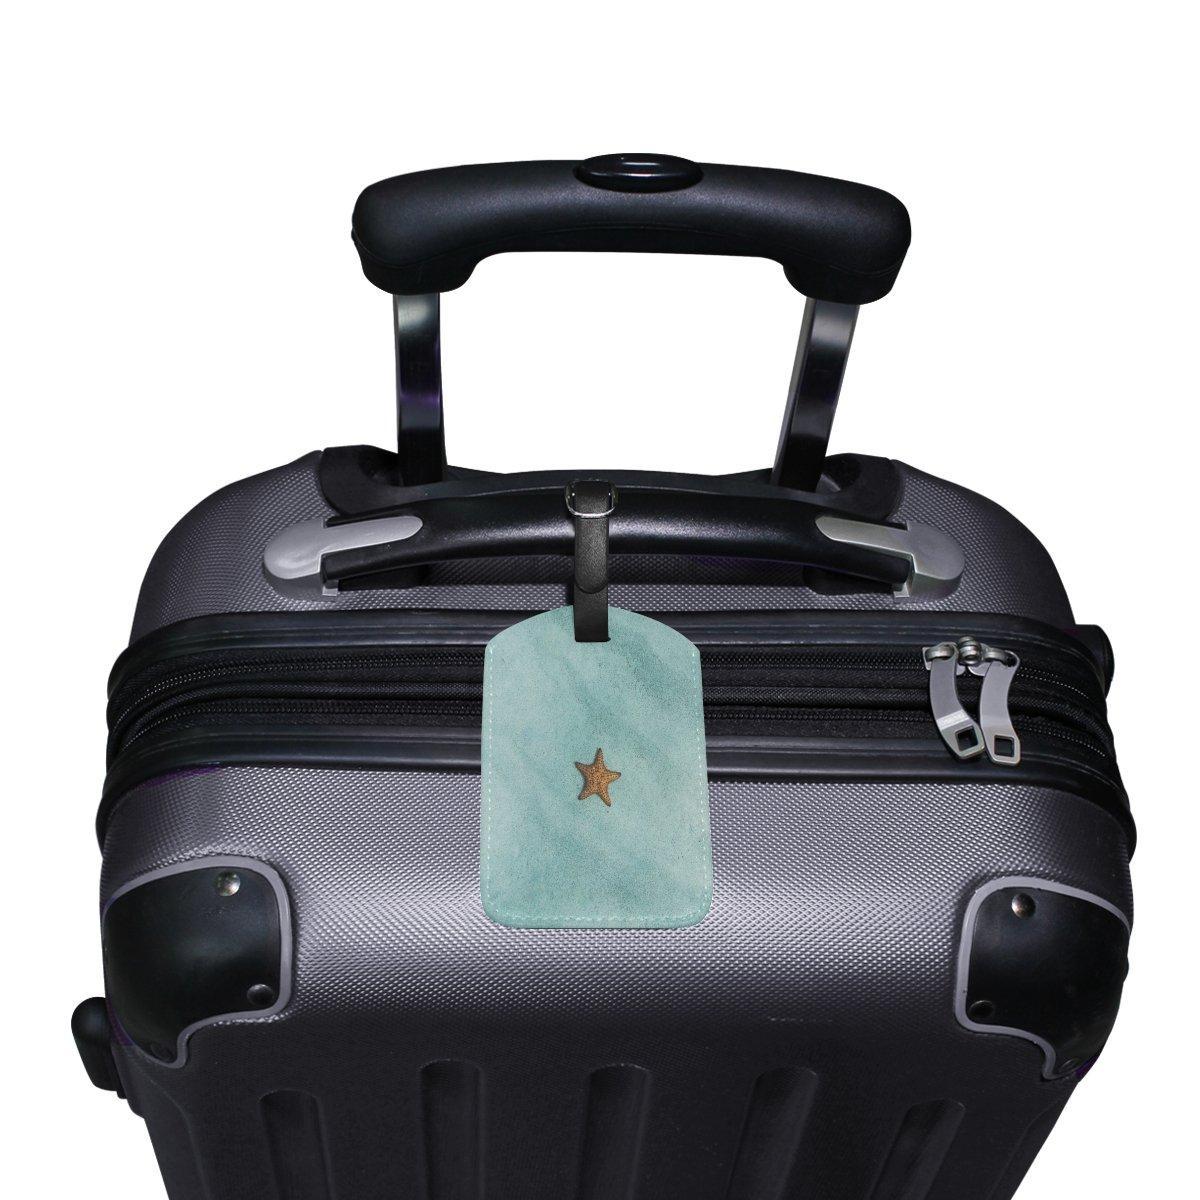 1Pcs Saobao Travel Luggage Tag Stars Blue Area PU Leather Baggage Suitcase Travel ID Bag Tag